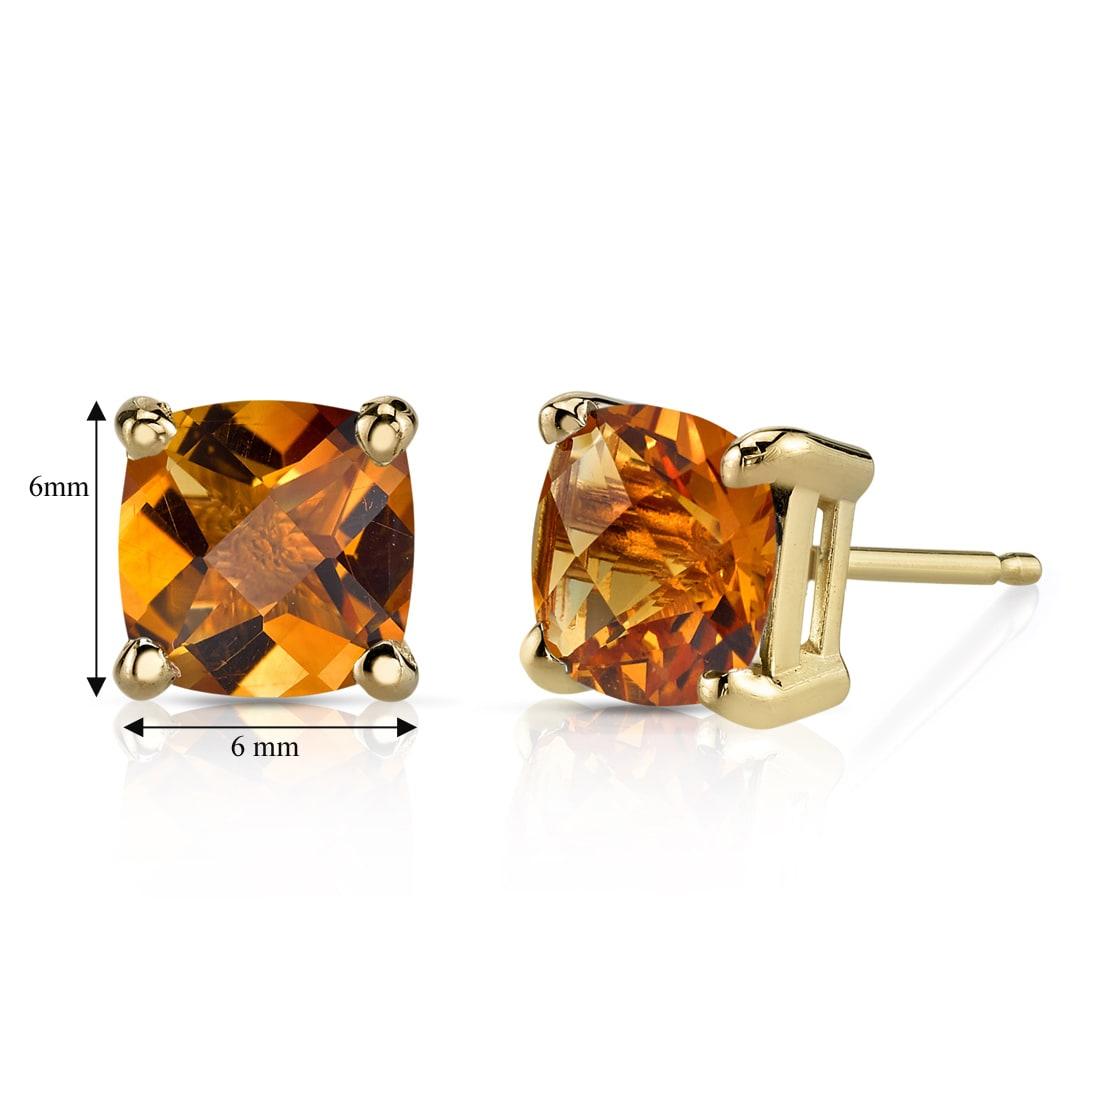 2ct Cushion Cut Yellow Citrine Diamond Halo Stud Earrings 14k White Gold Finish